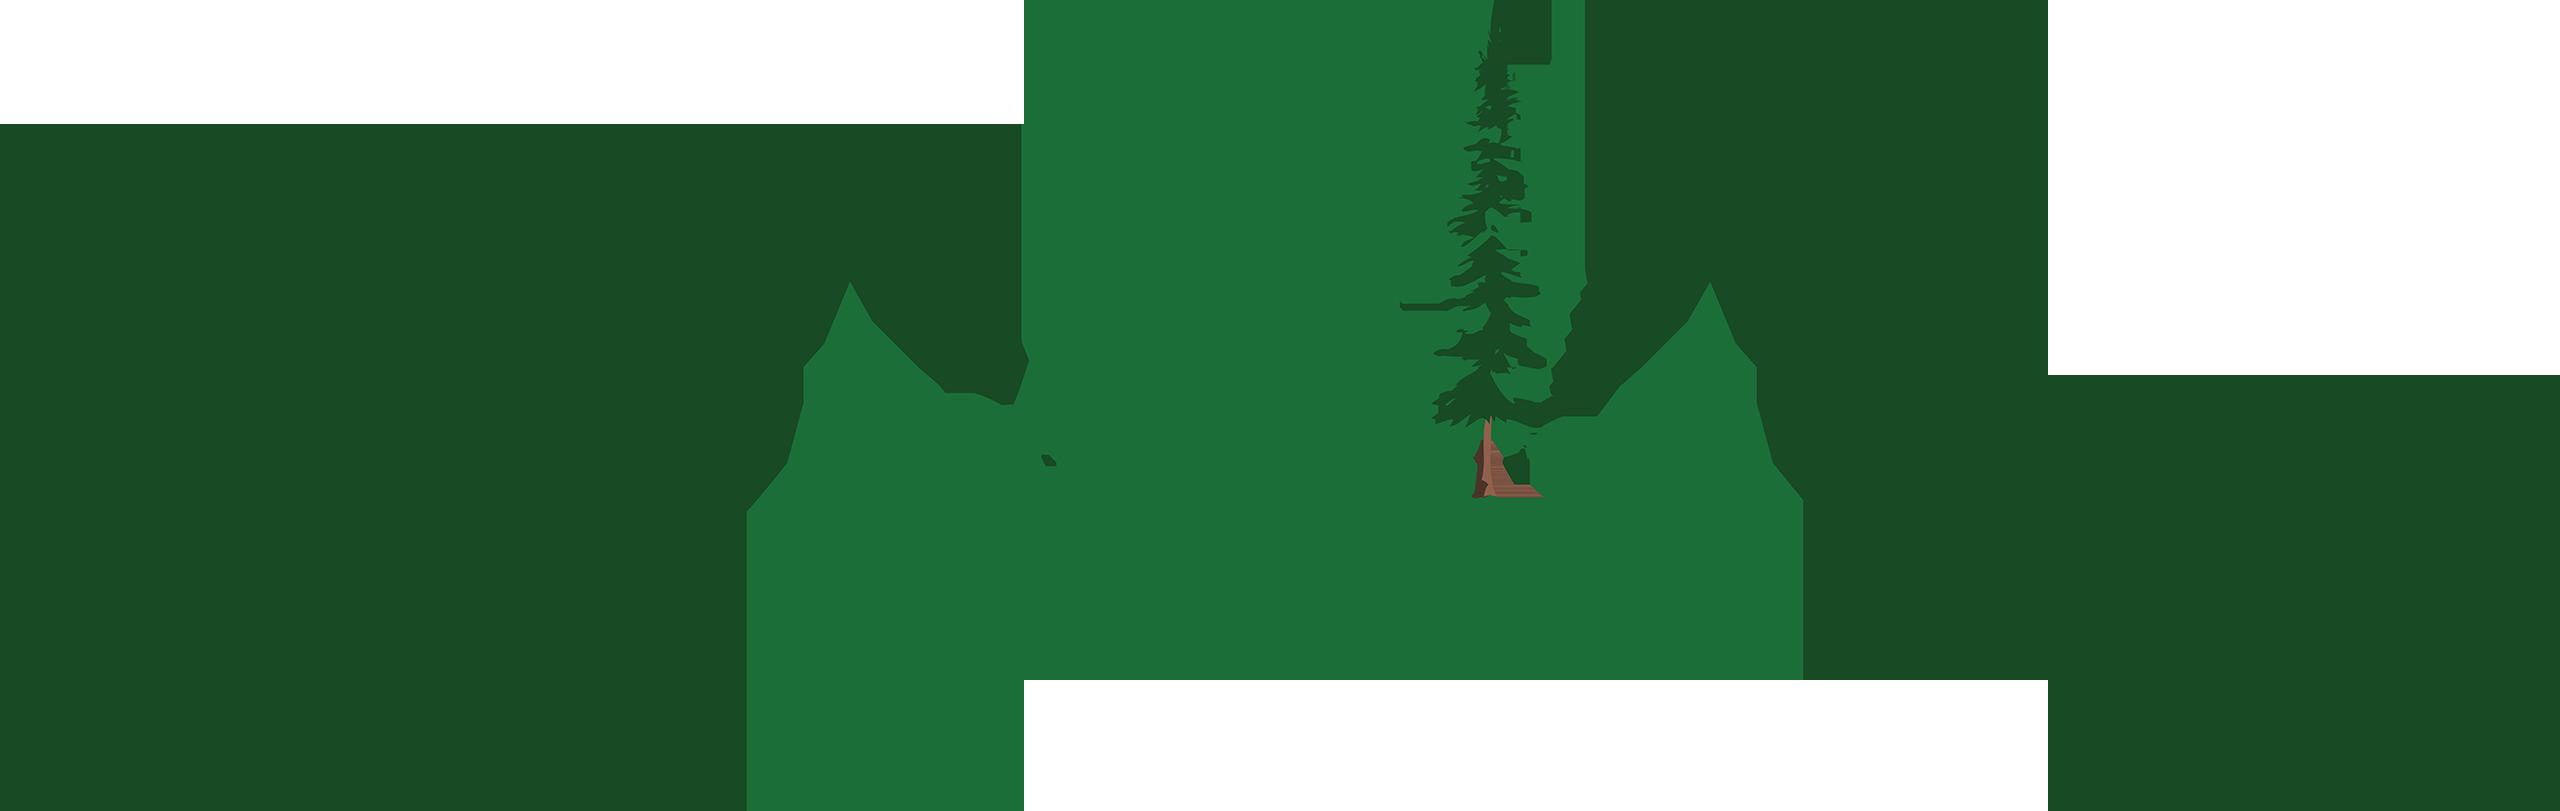 Национални парк Дрина - Nacionalni park Drina